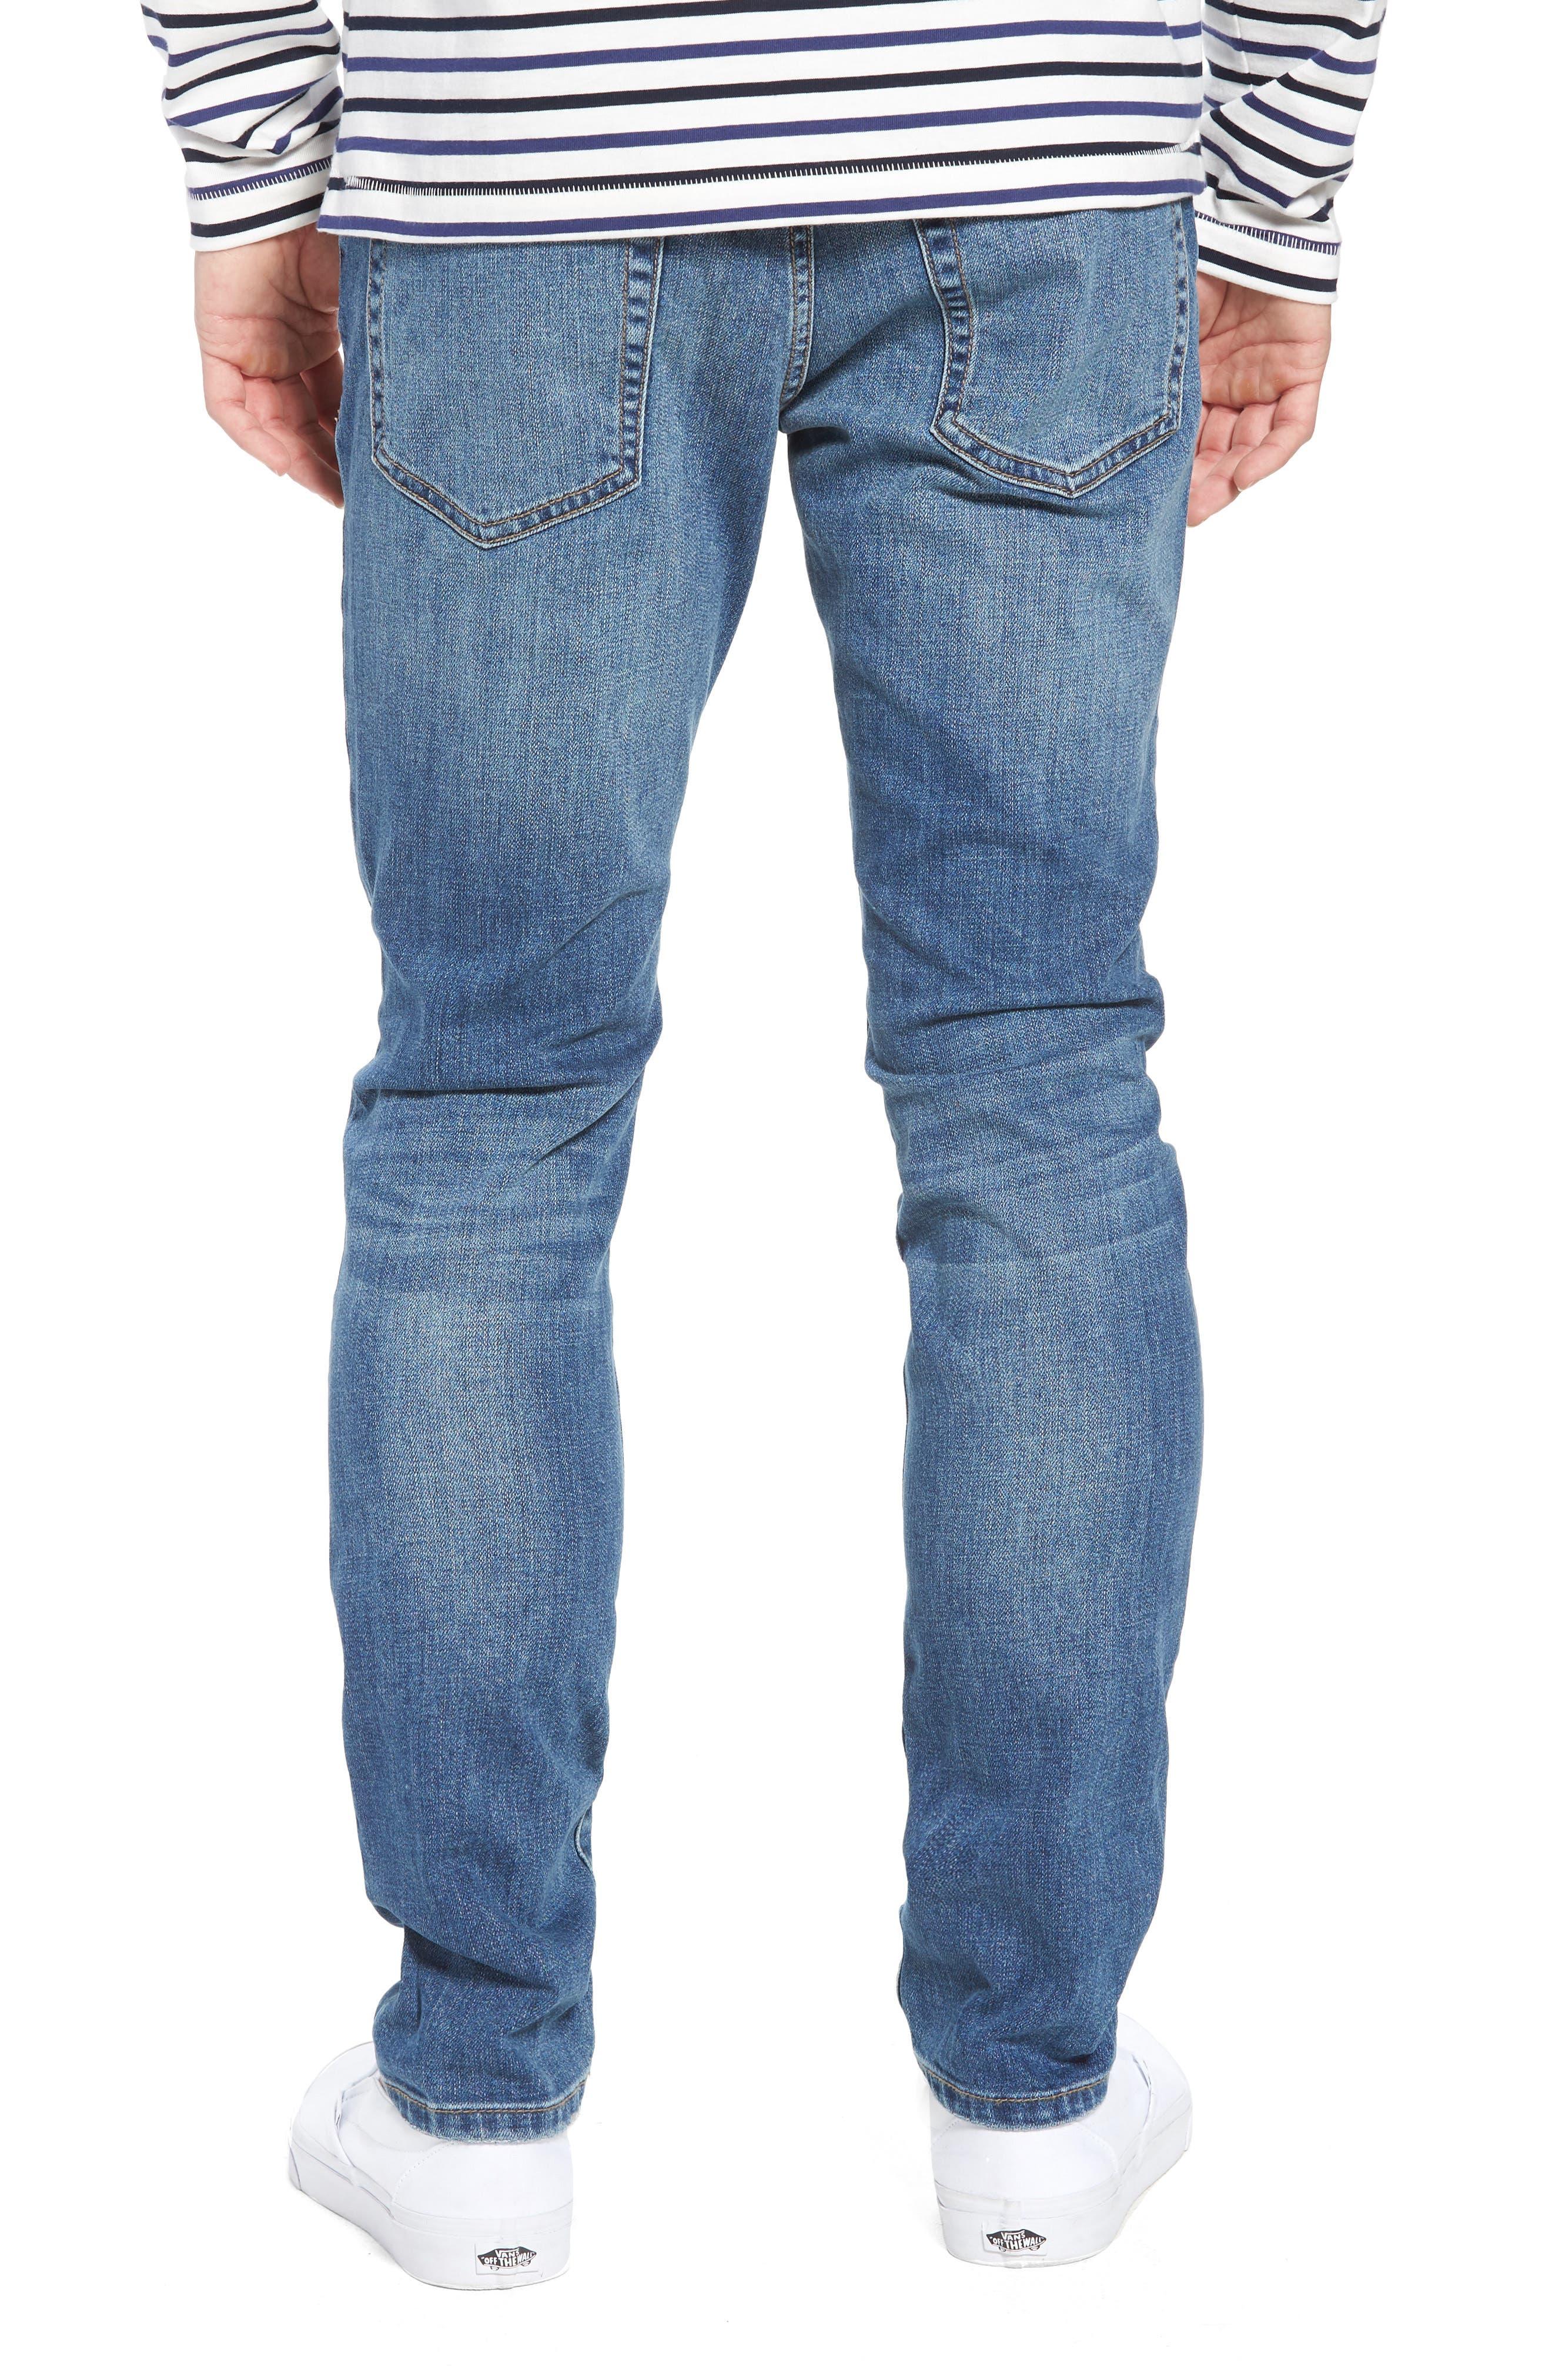 Jeans Co. Bond Skinny Fit Jeans,                             Alternate thumbnail 2, color,                             Bryson Vintage Medium